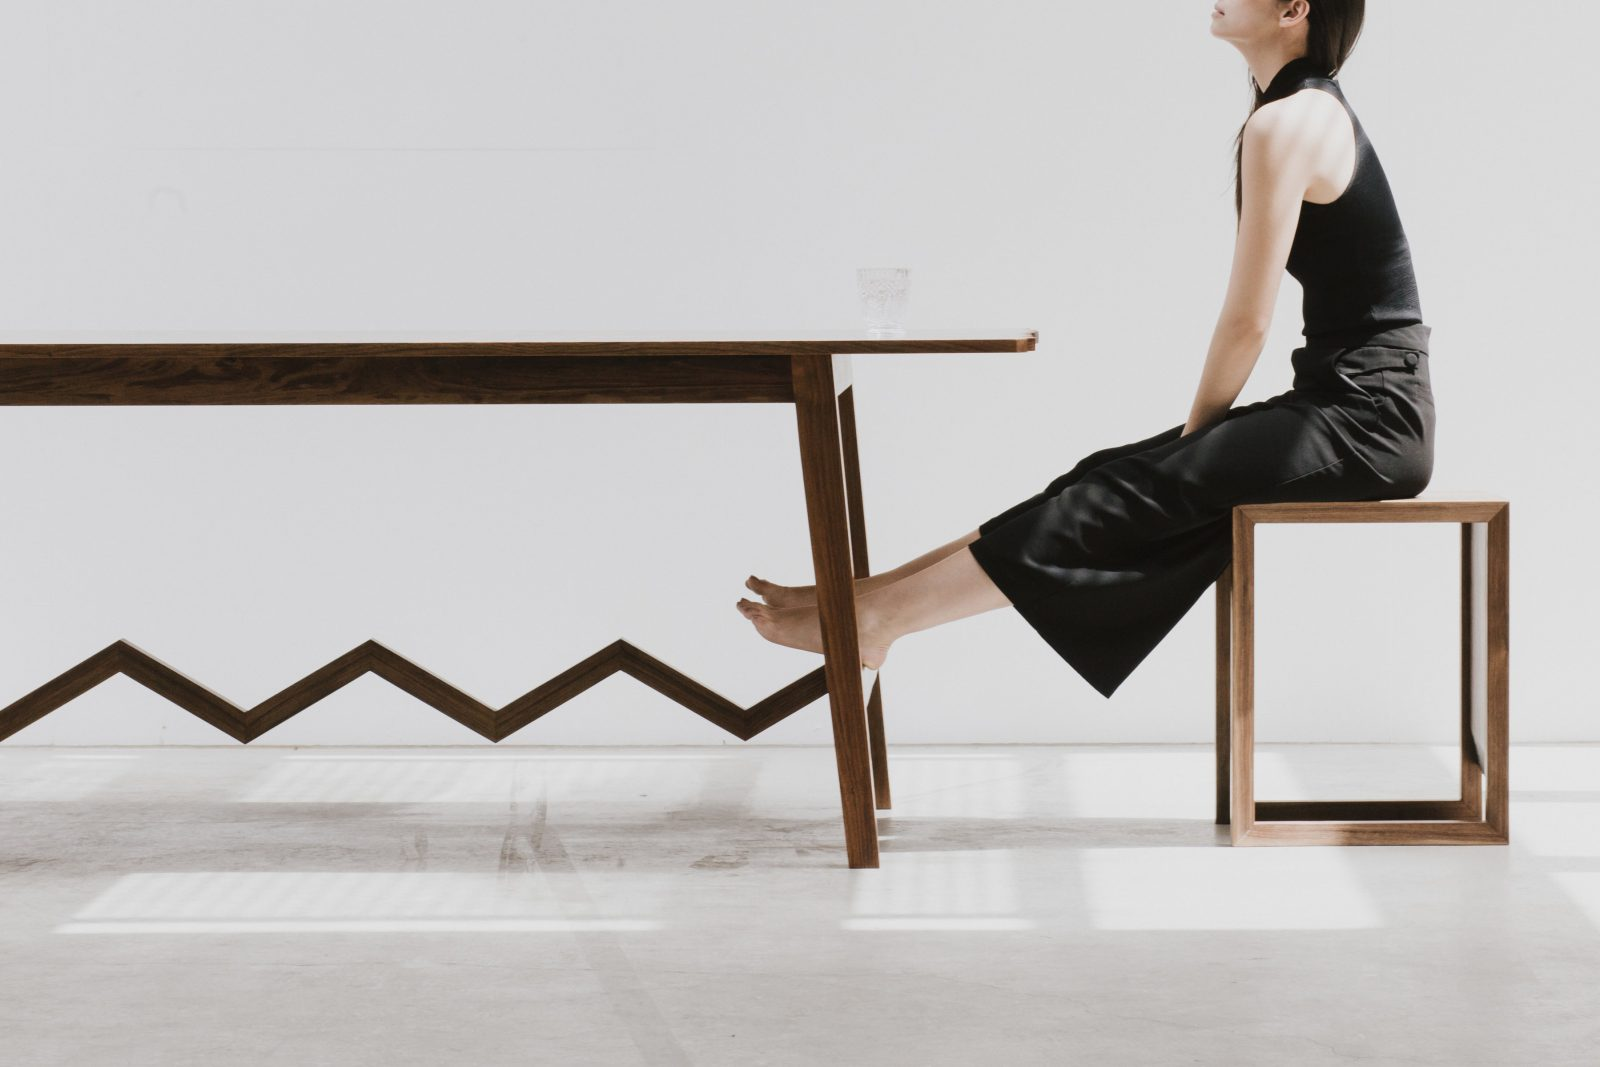 Chelsea Lemon, Serrated table. Concept and creative direction: Stephanie @the_nameless_blog and Jessica Di Scipio @jessdiscipio. Photo:  Jenny Wu @jennywuphotography.  Model: Alex Rubio @xel_rex_